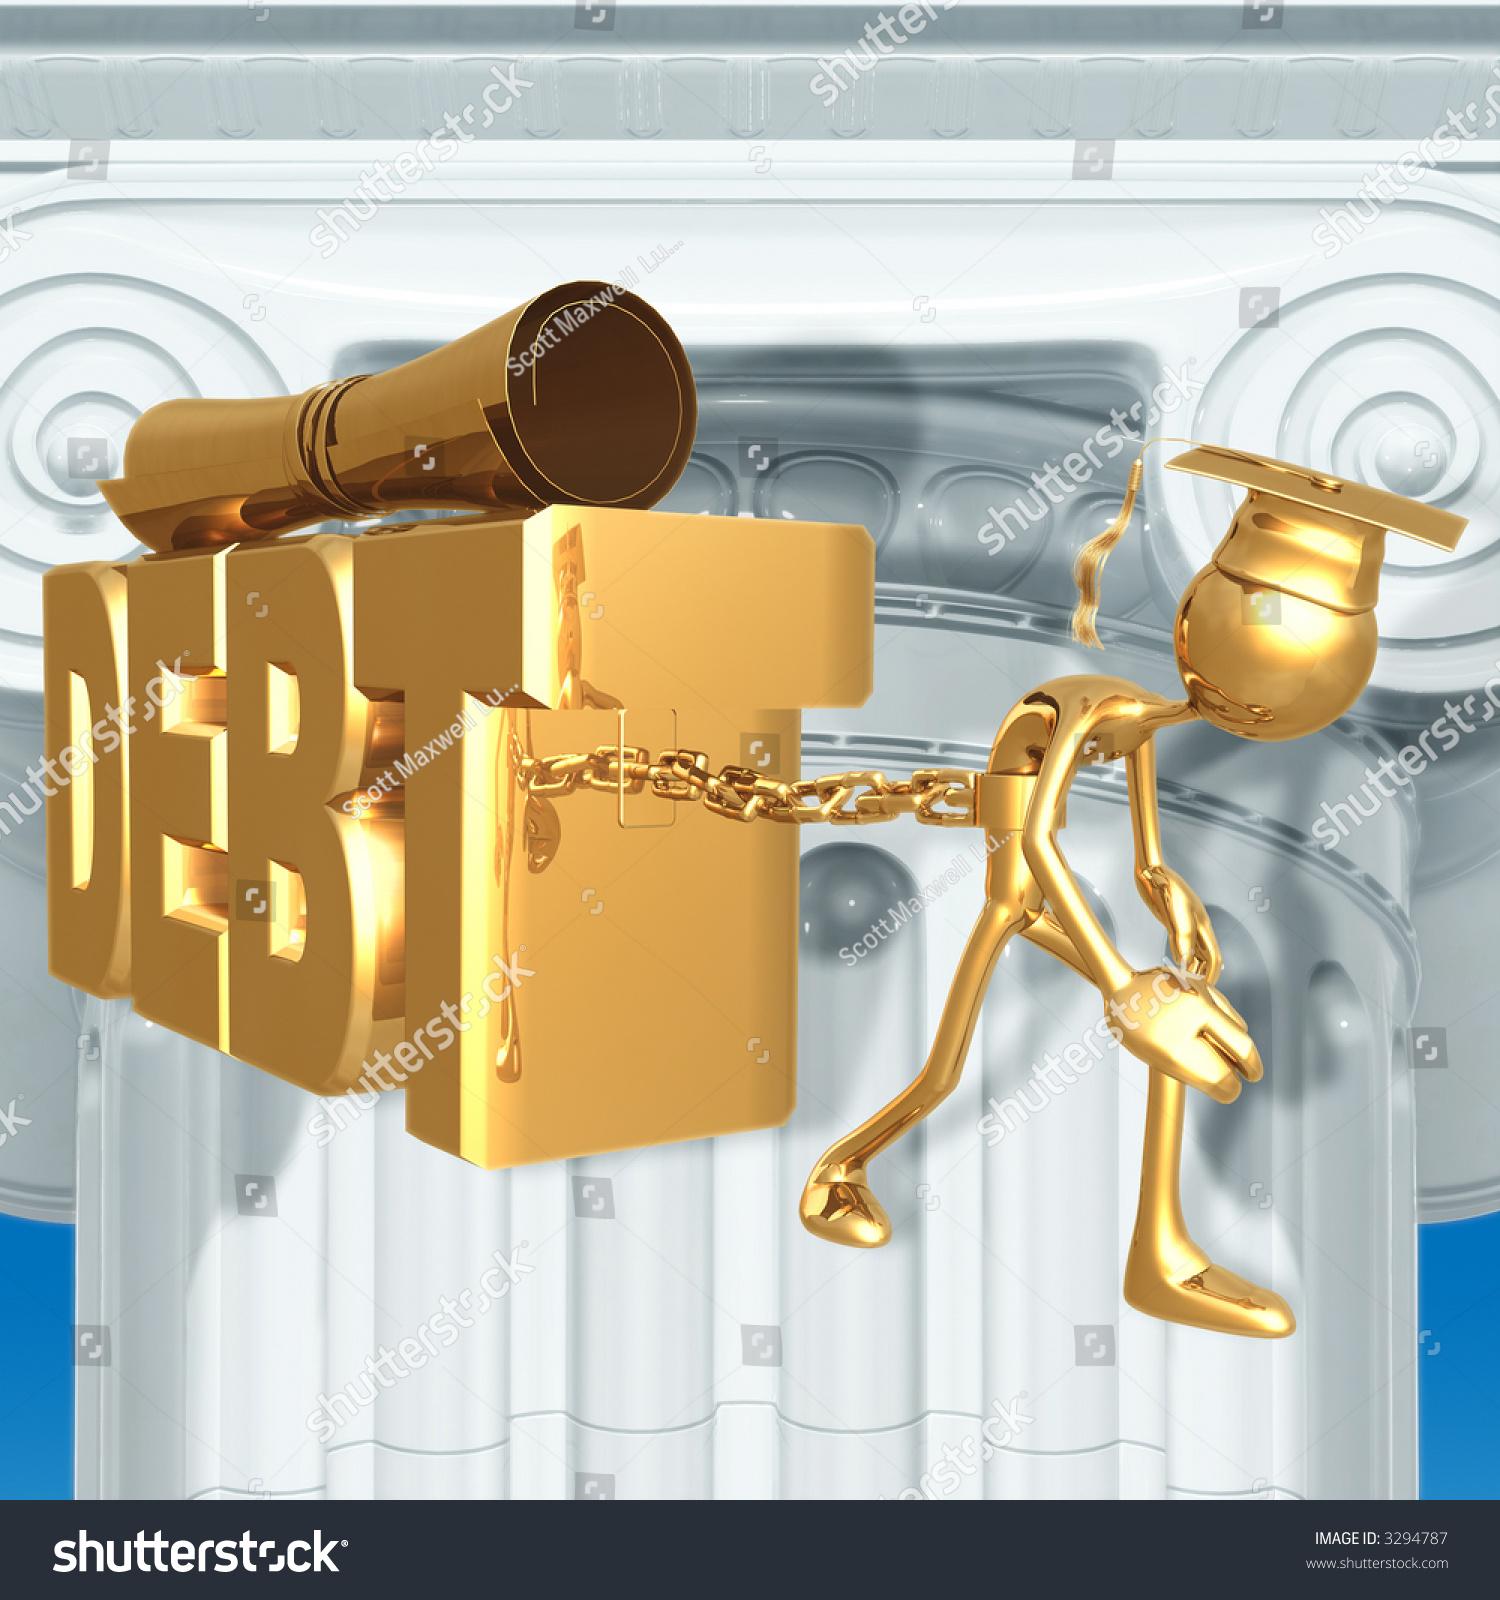 golden grad chained to education debt graduation concept stock photo 3294787 shutterstock. Black Bedroom Furniture Sets. Home Design Ideas